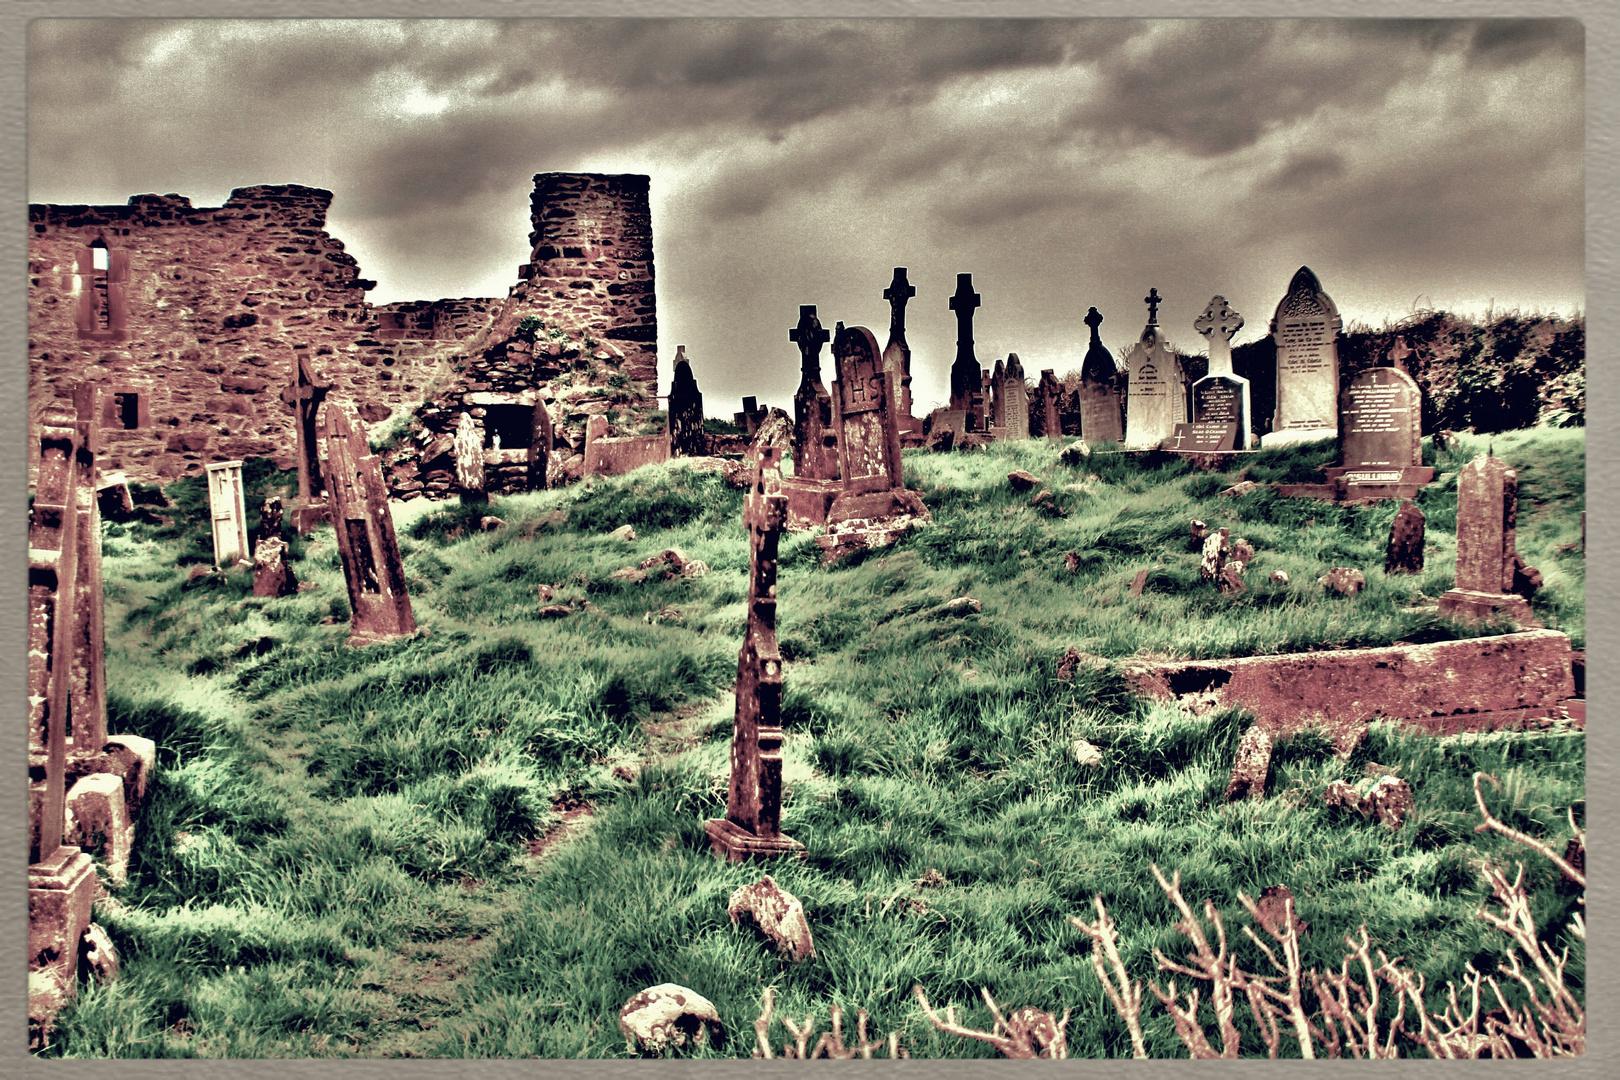 Baile an Sceilg / Ballinskelligs, Priory